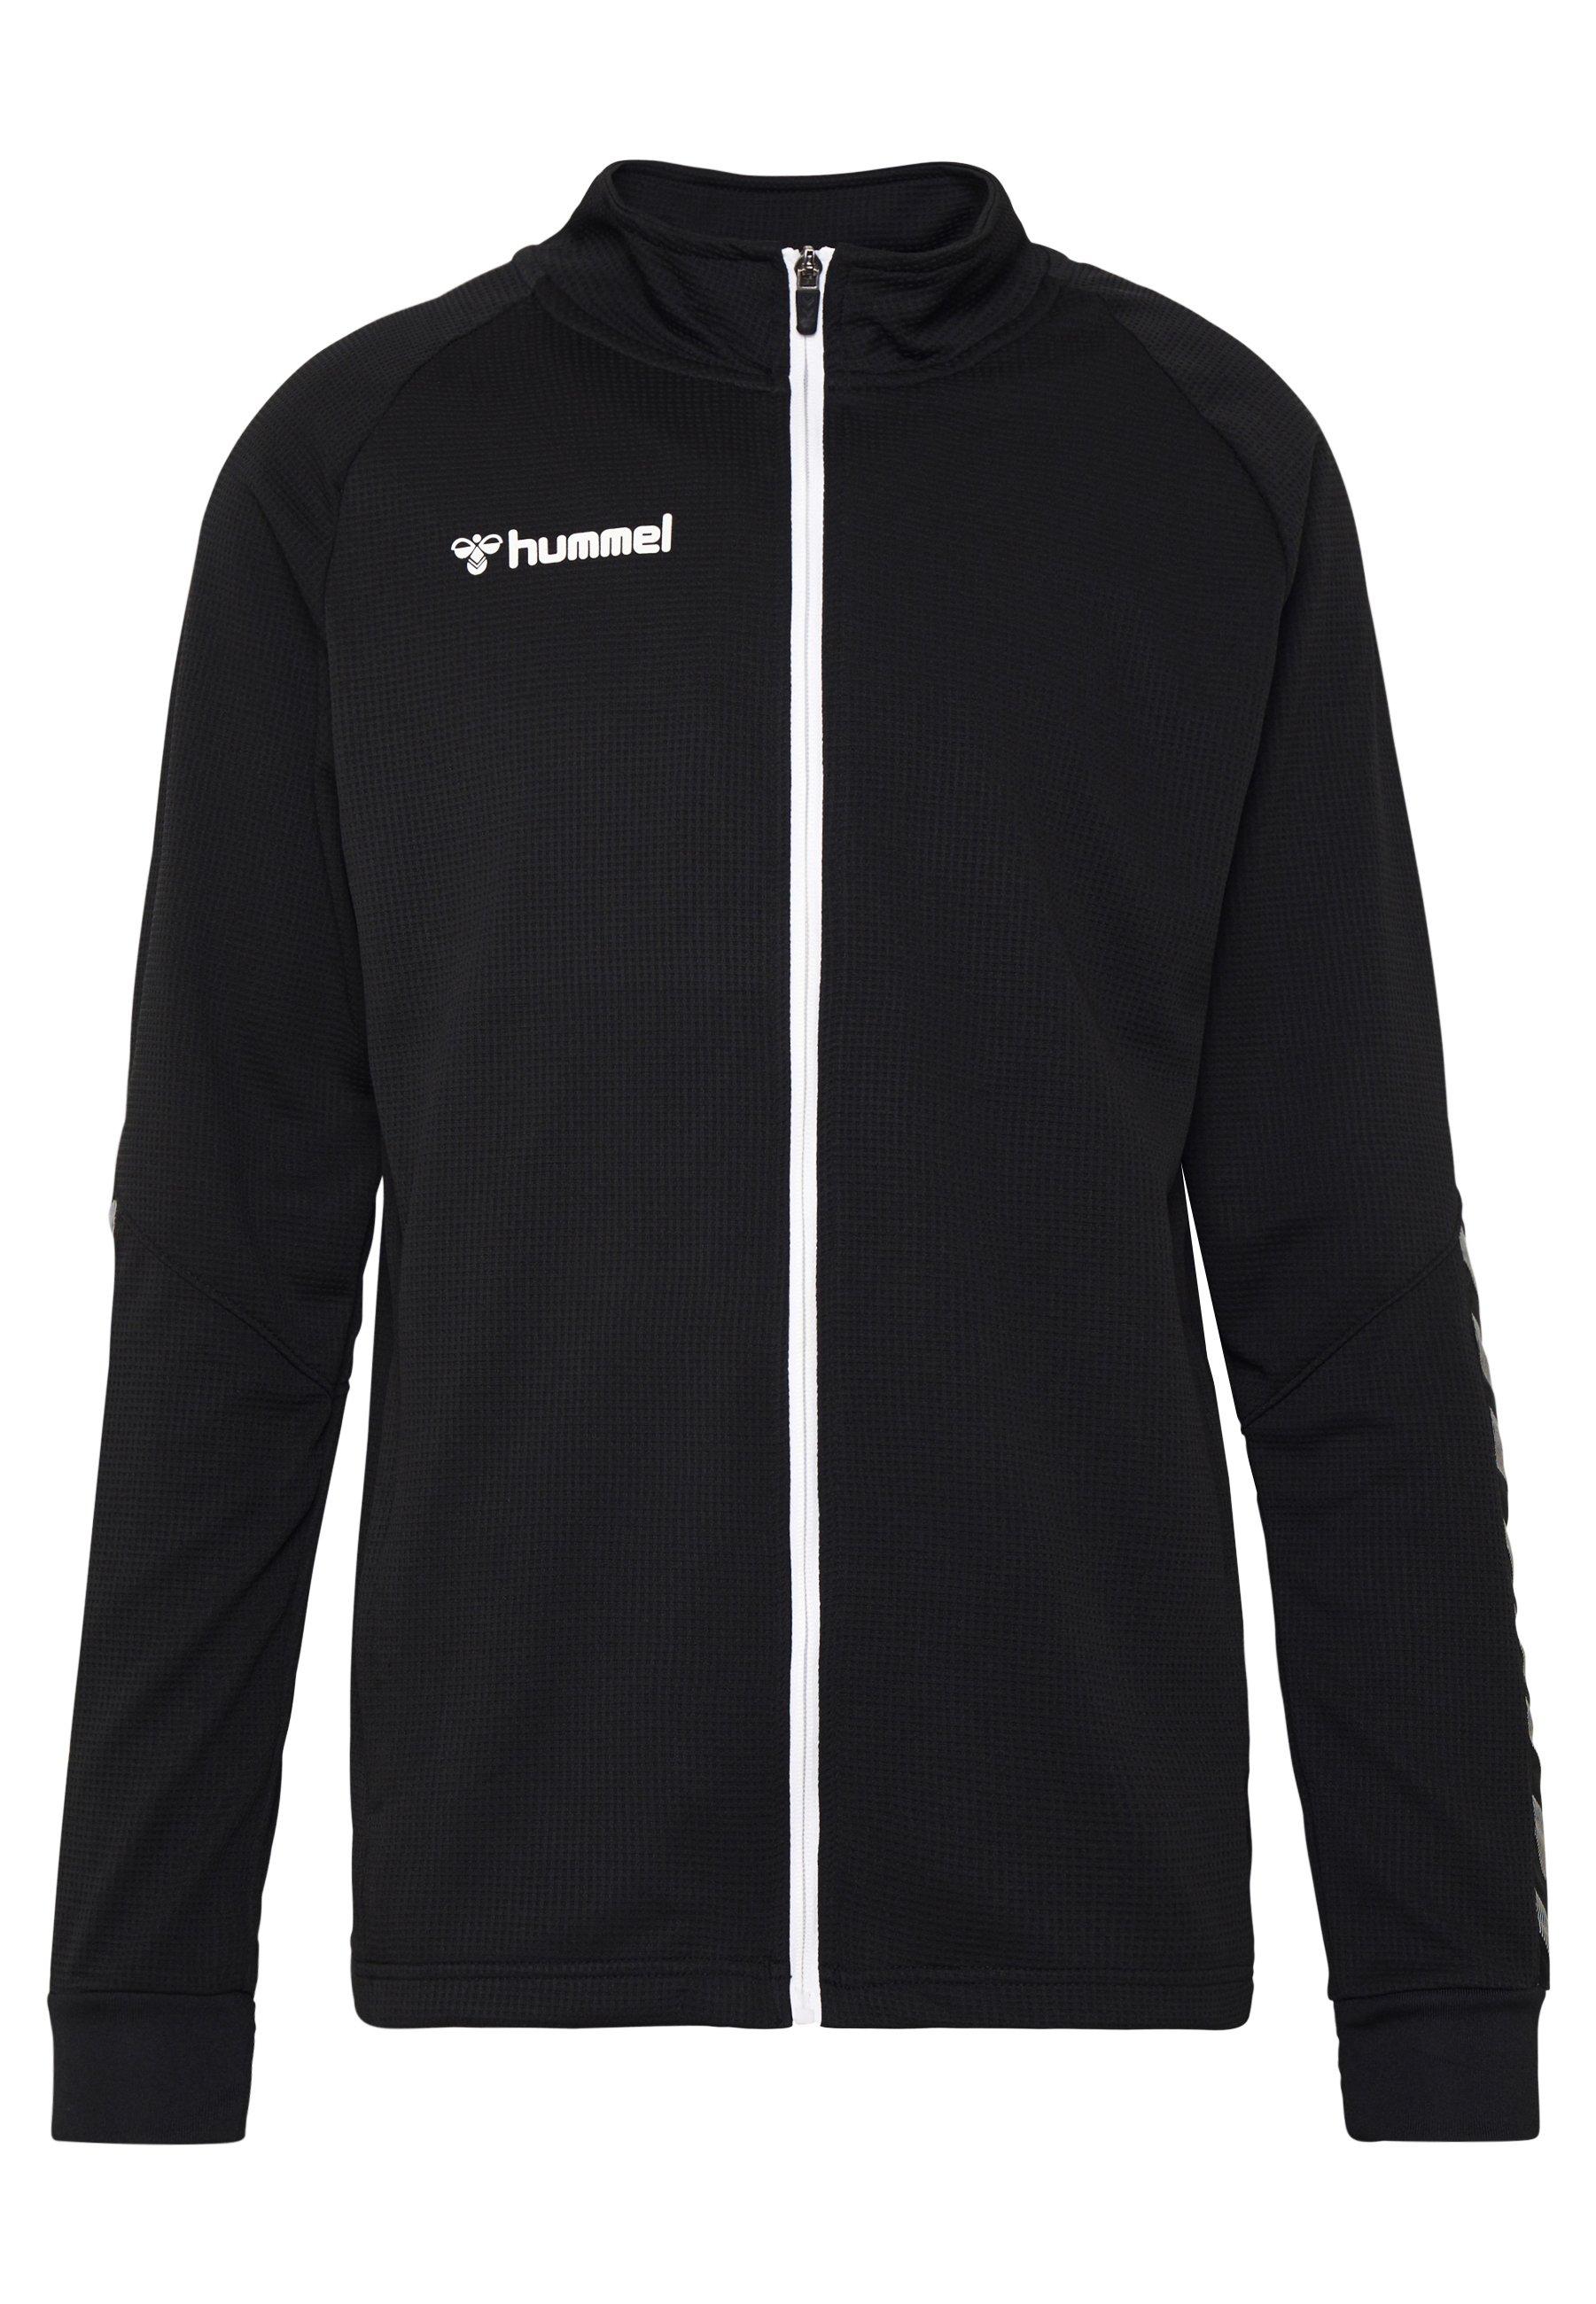 Hummel AUTHENTIC ZIP JACKET - Giacca sportiva - black/white